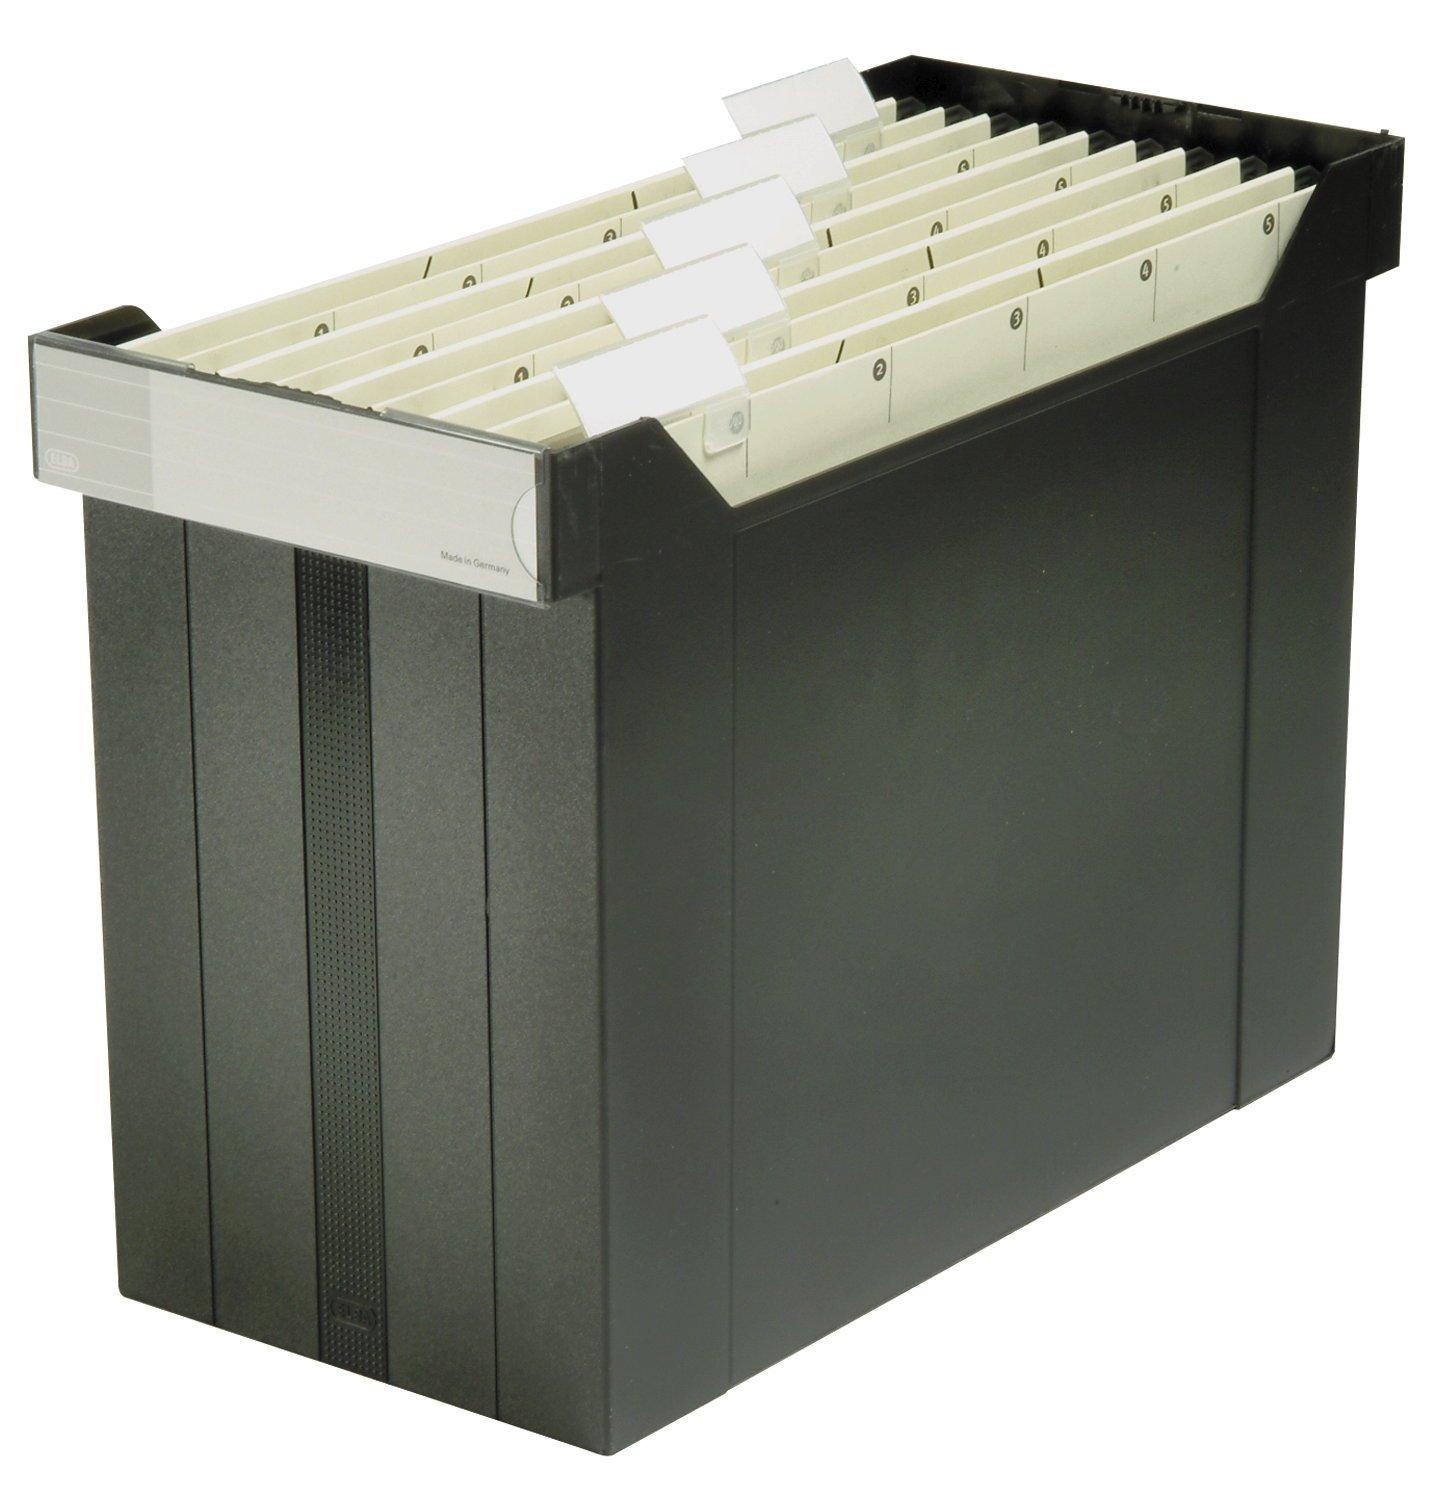 Elba 80491 - Portacartelle sospese Go-Fix 1000, 8 cartelle sospese incluse, 1 pezzo, nero Hamelin Brands 400005232